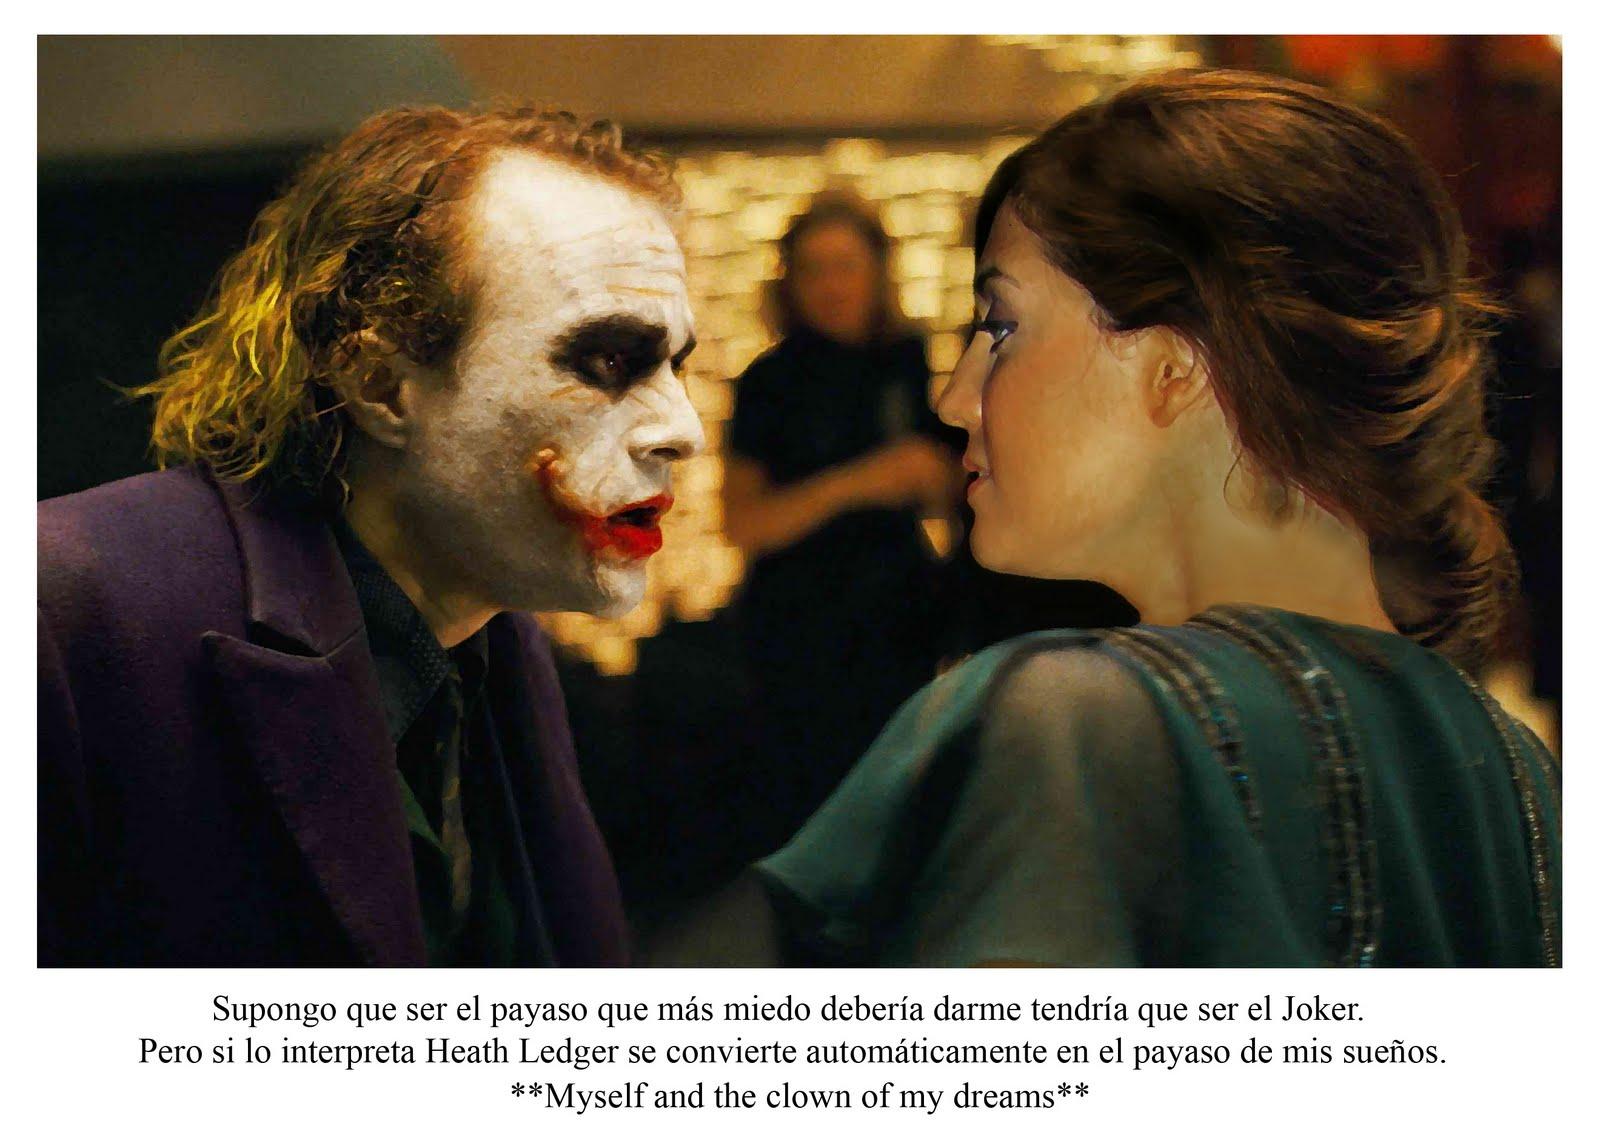 http://4.bp.blogspot.com/-QOa8SgZQHIA/TbugP6R739I/AAAAAAAAAdU/I4m1XDzYsoU/s1600/Joker-Lange-Montparnasse-sofia-navarro.jpg